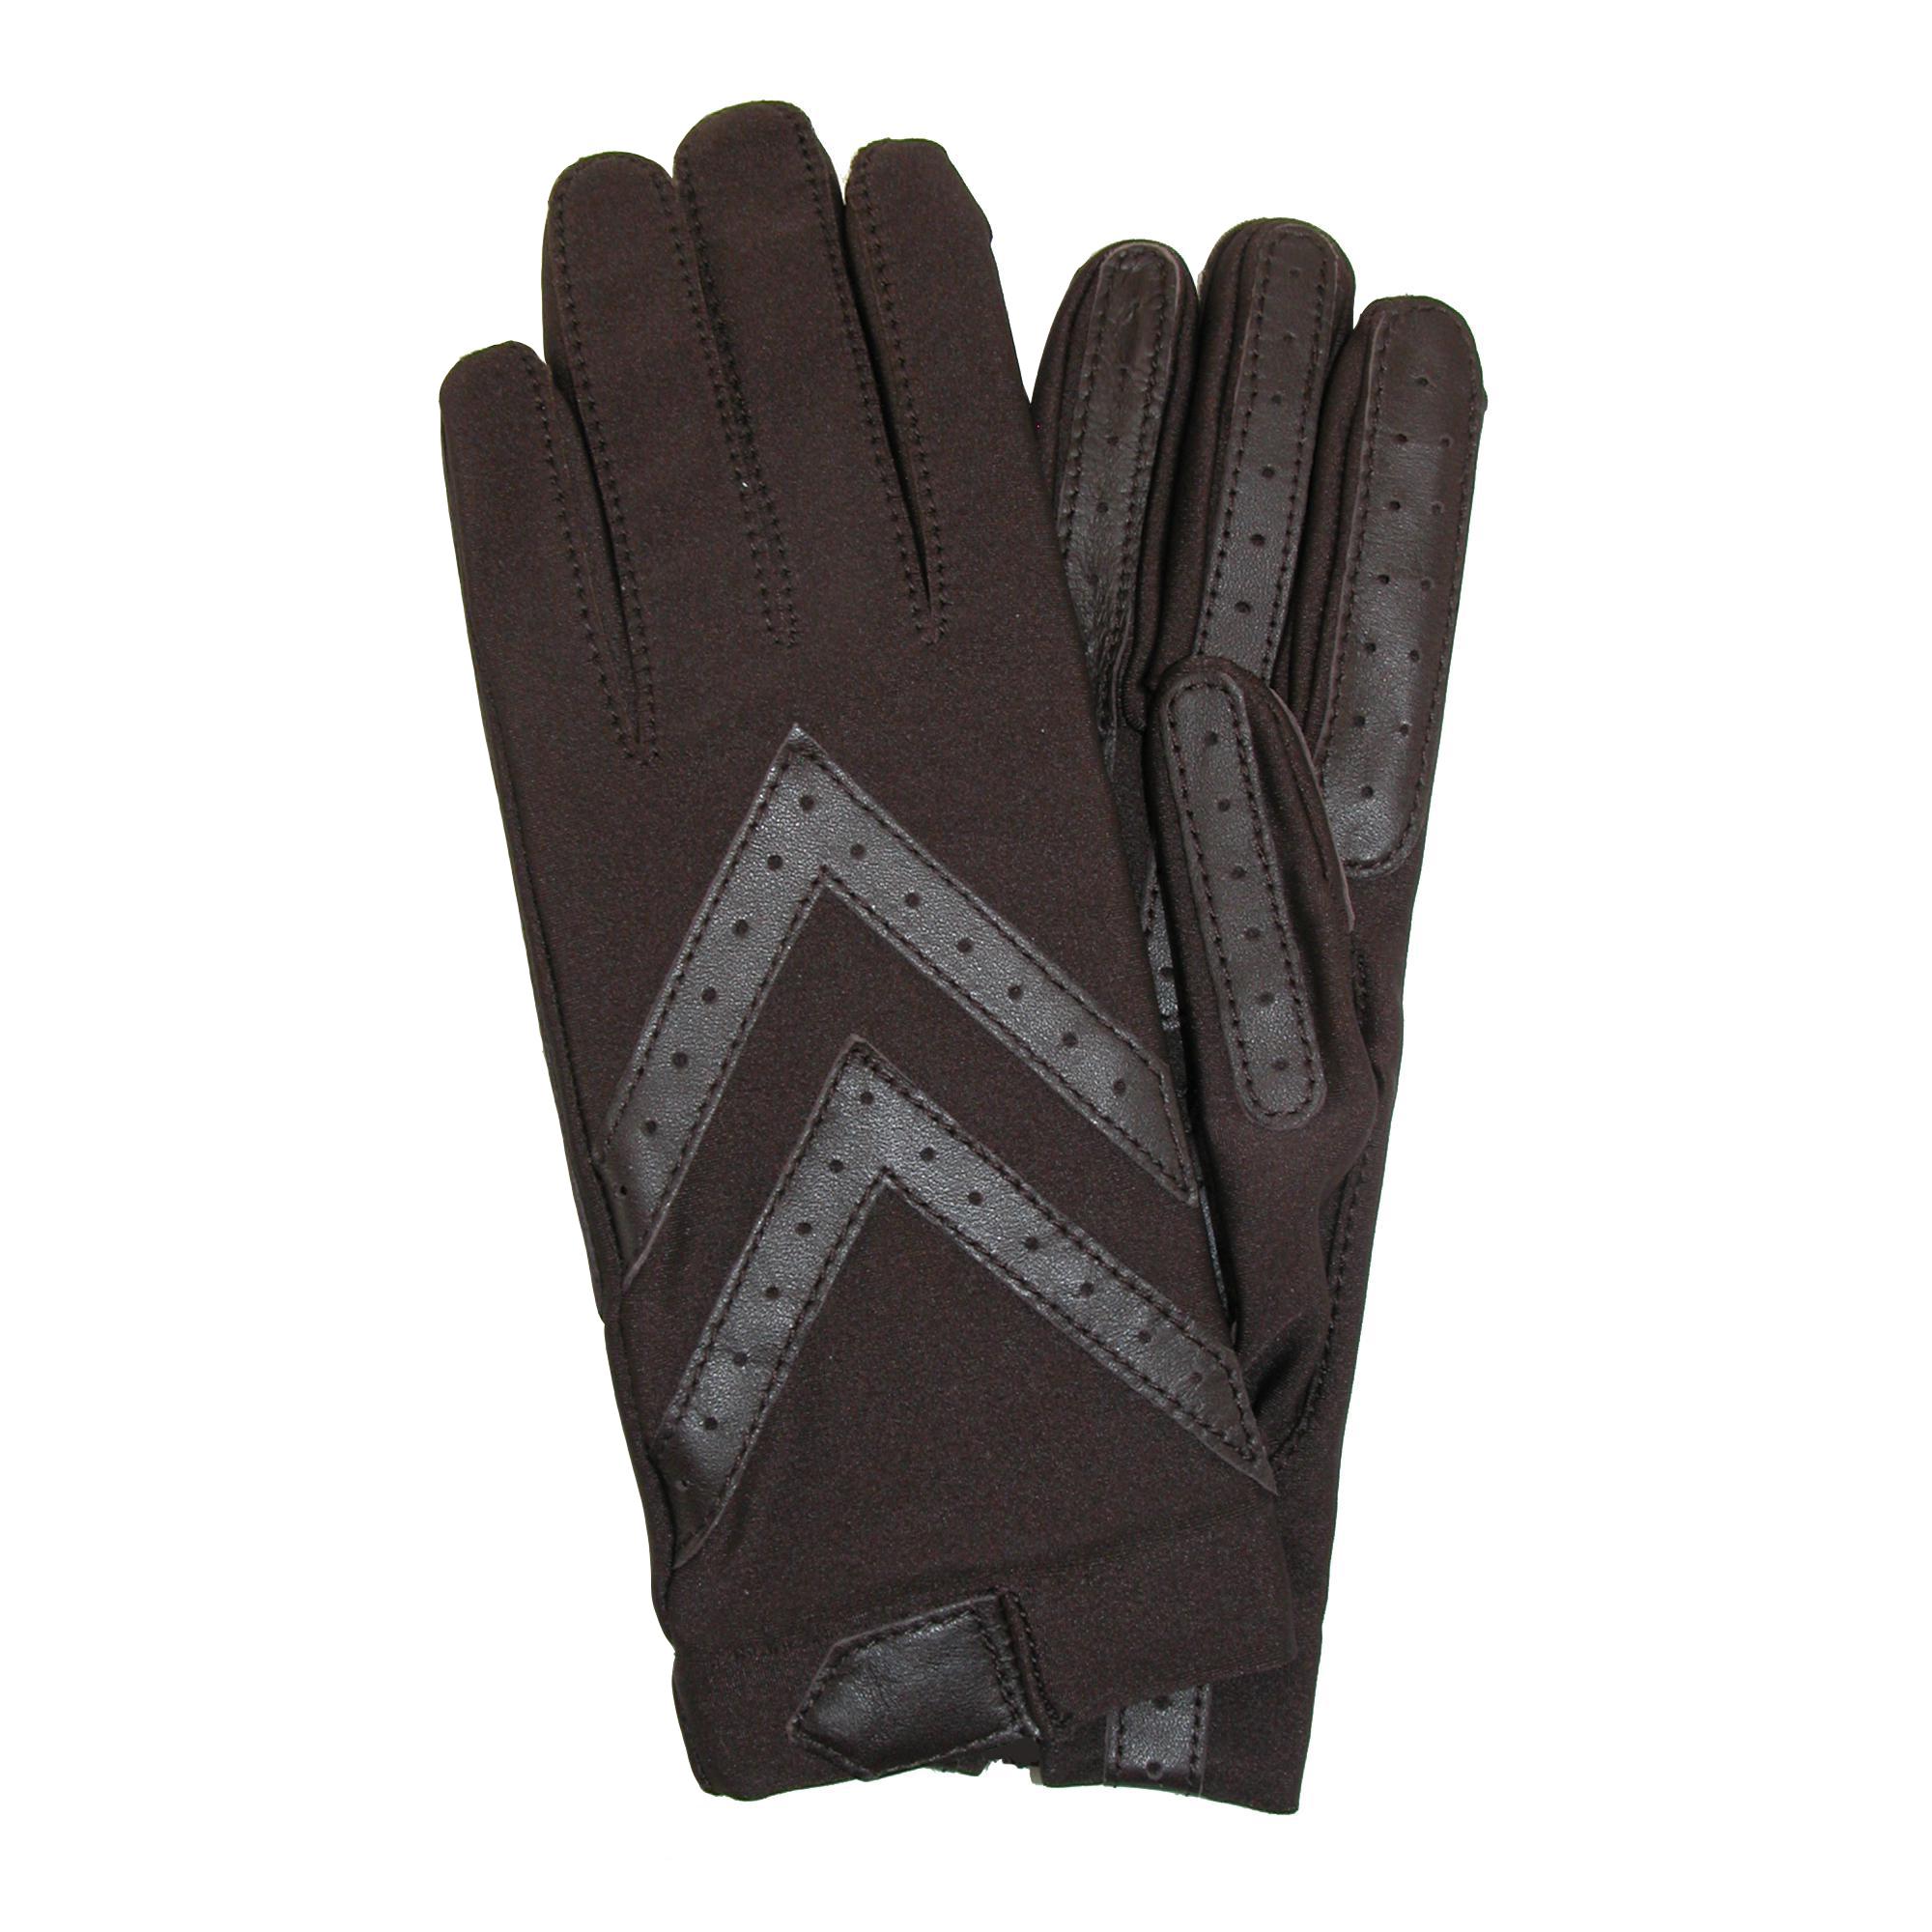 Fingerless gloves isotoner -  Picture 7 Of 18